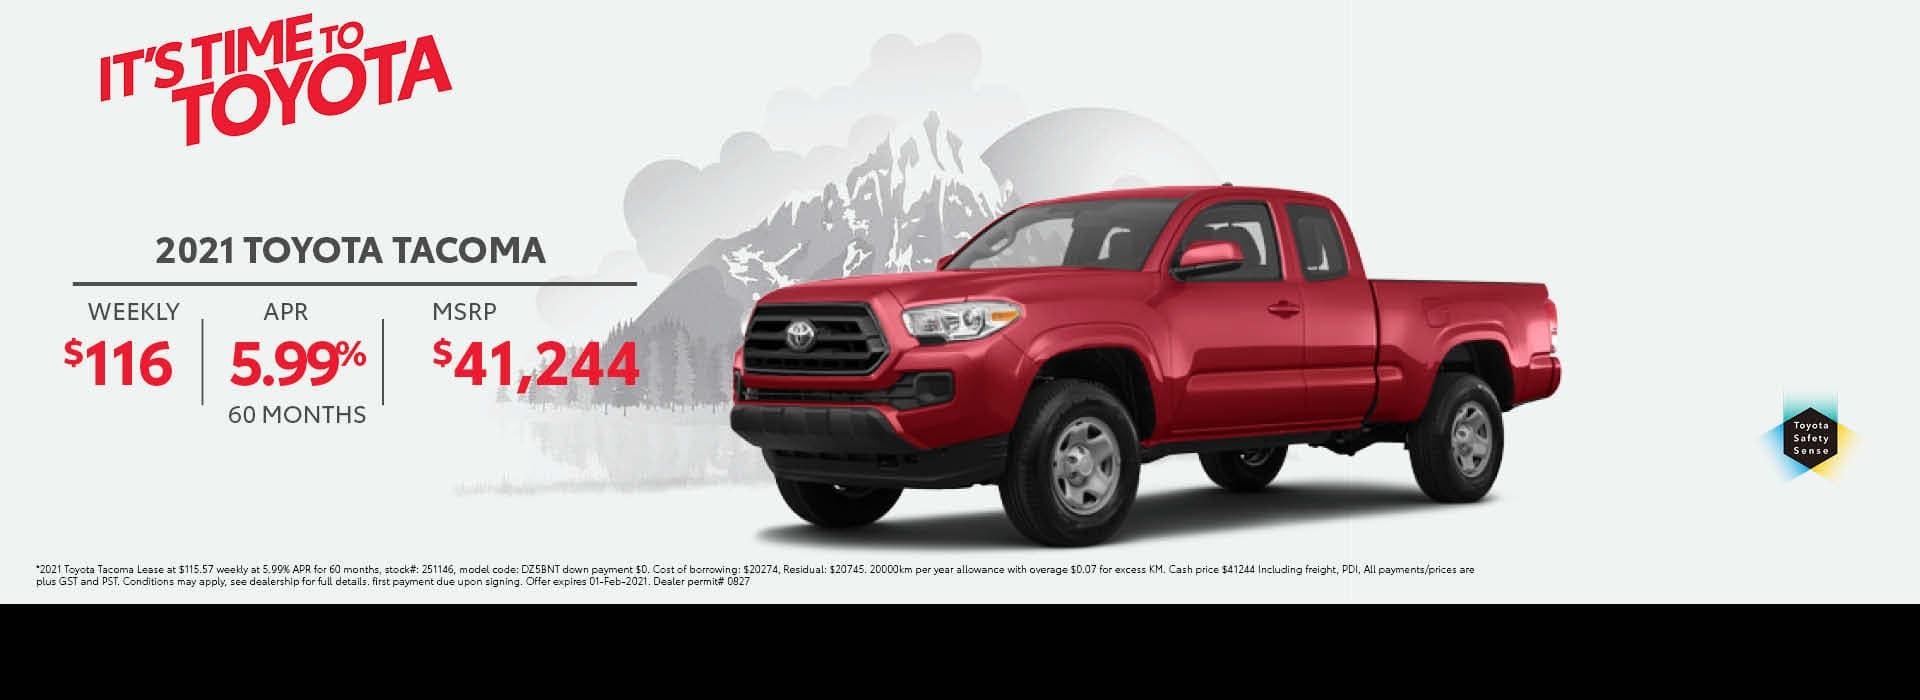 2021_Toyota_Tacoma_Desktop_Jan2021